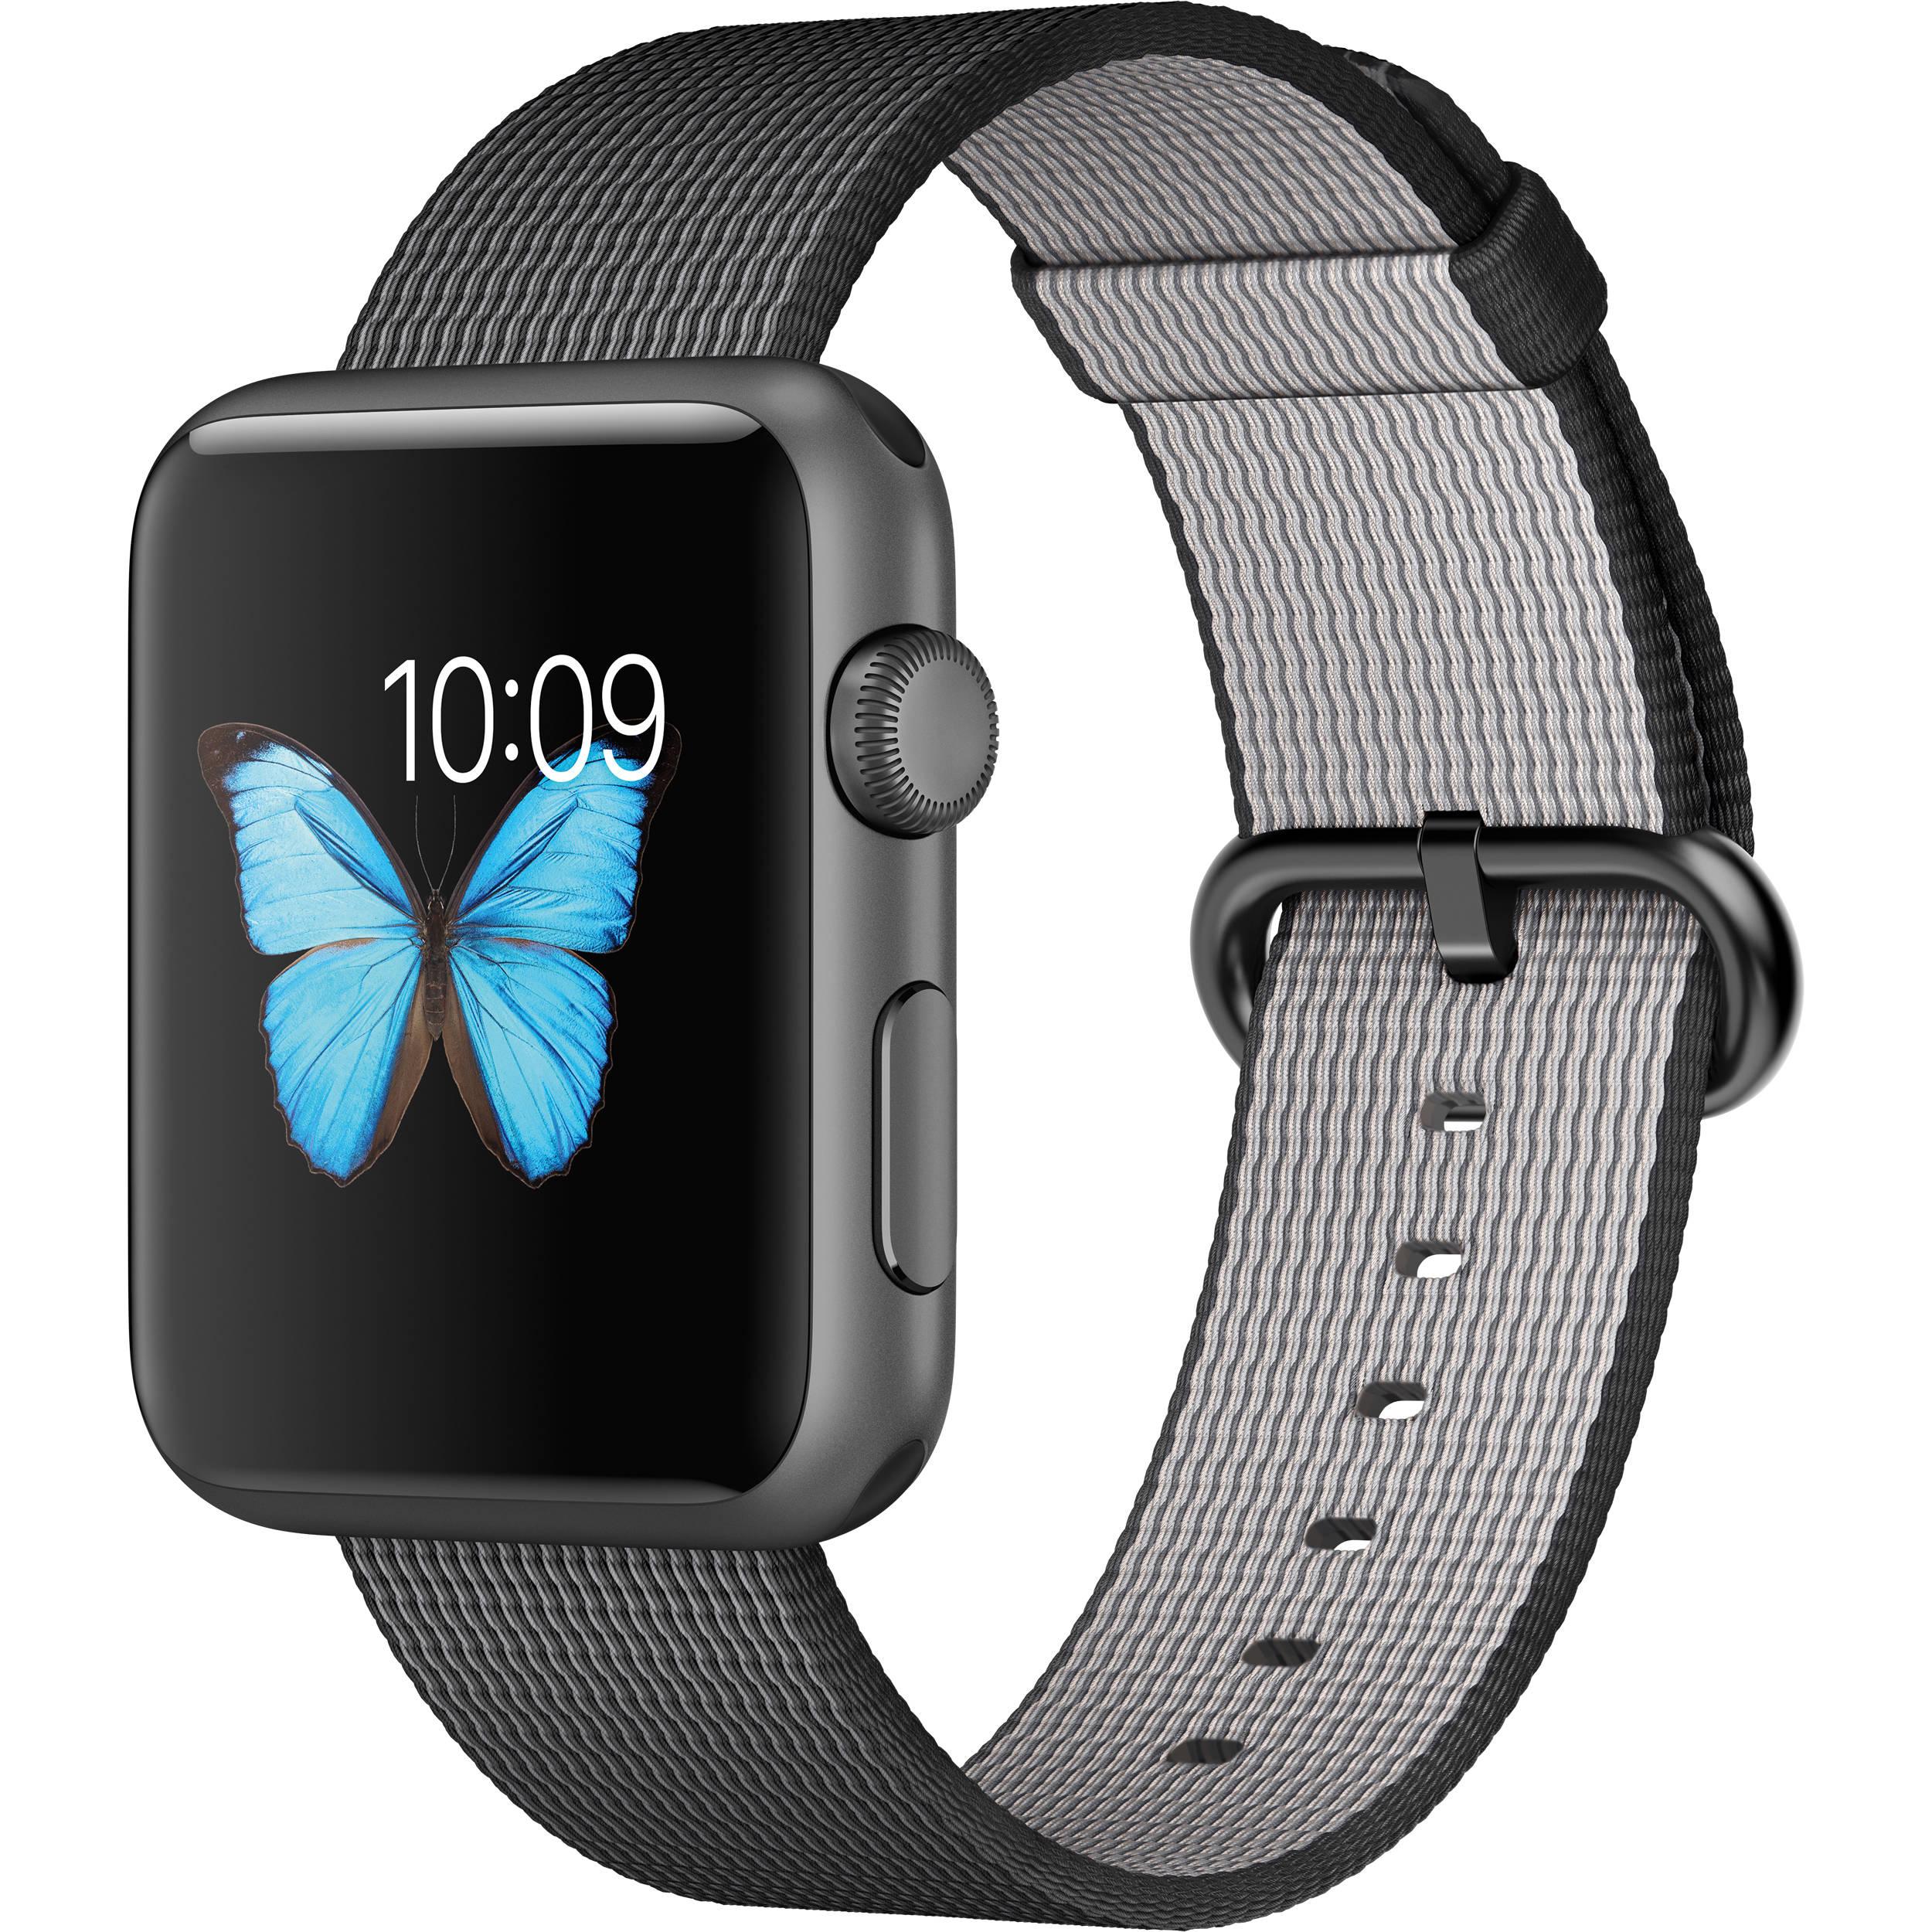 1165a13c71e4 Apple Watch Sport 42mm Smartwatch (2015, Space Gray Aluminum Case, Black  Woven Nylon Band)